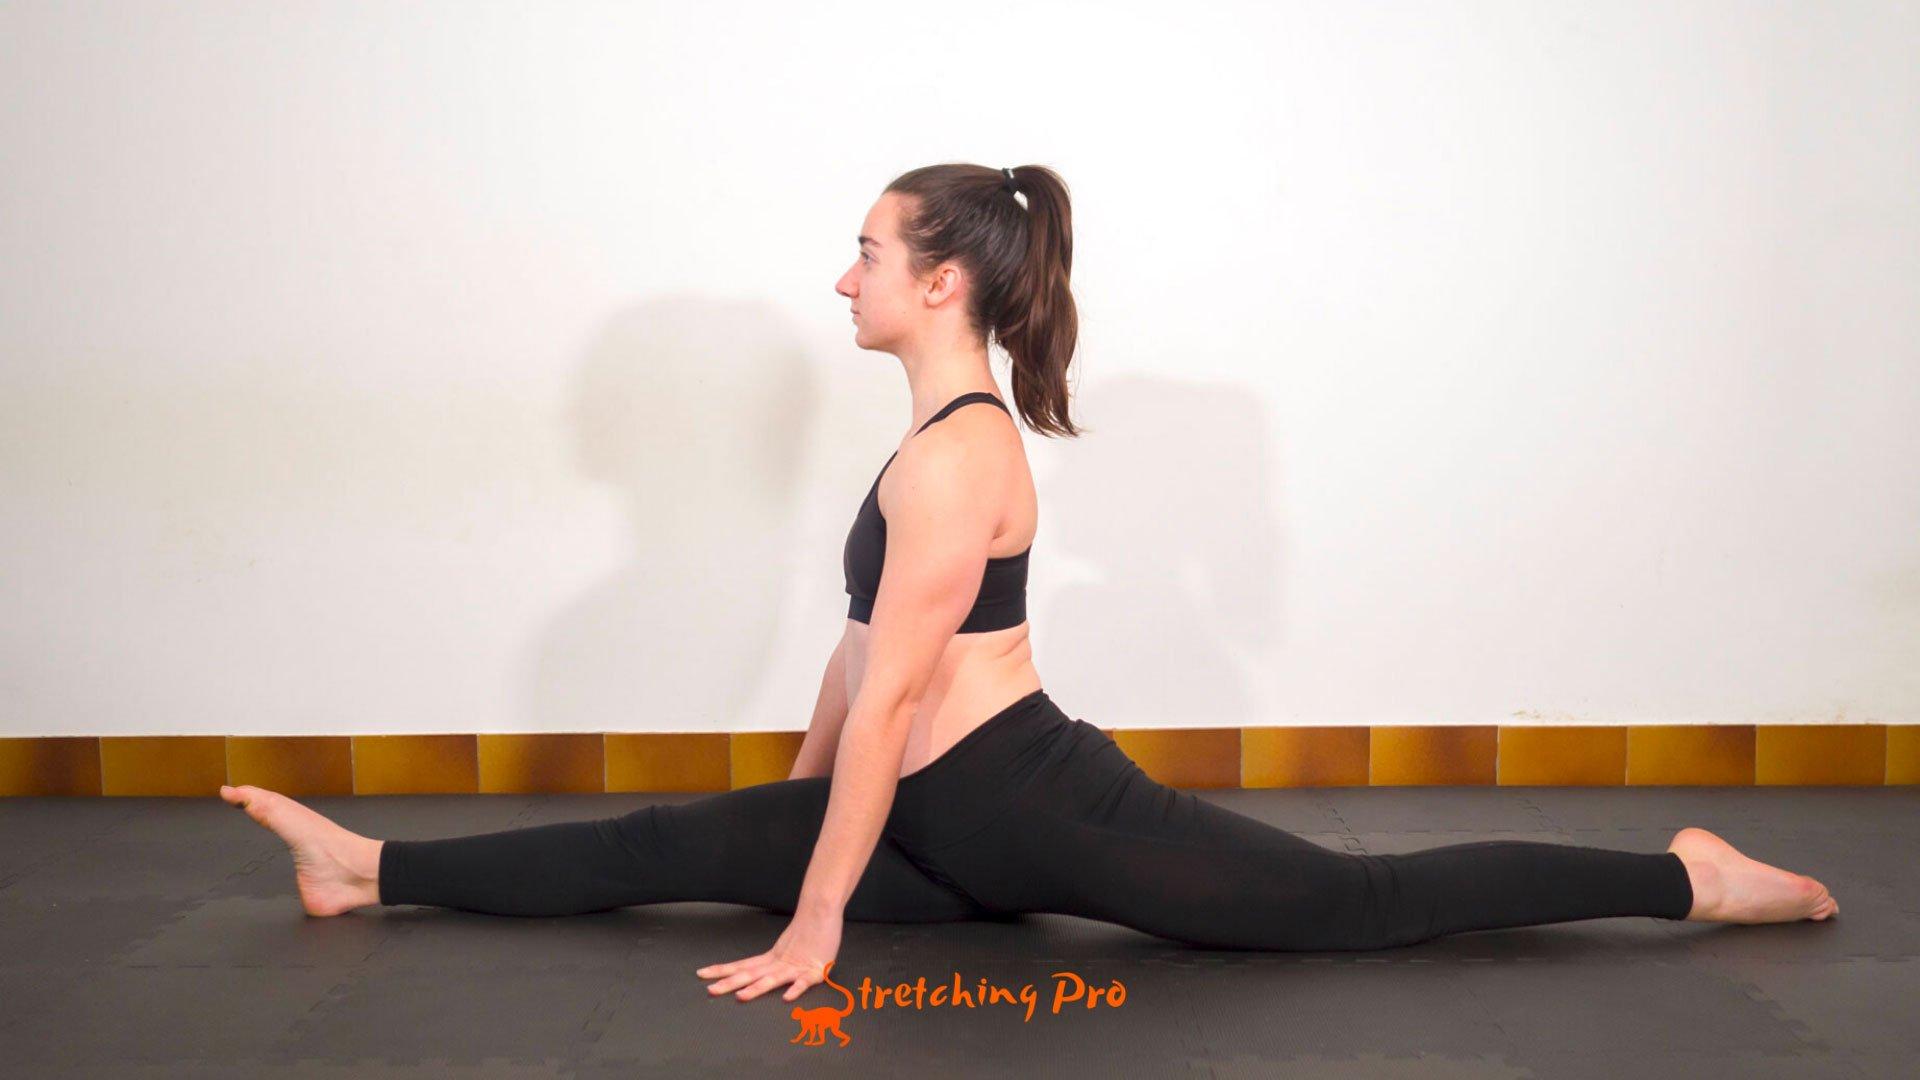 stretchingpro-apprendre-grand-écart-latéral